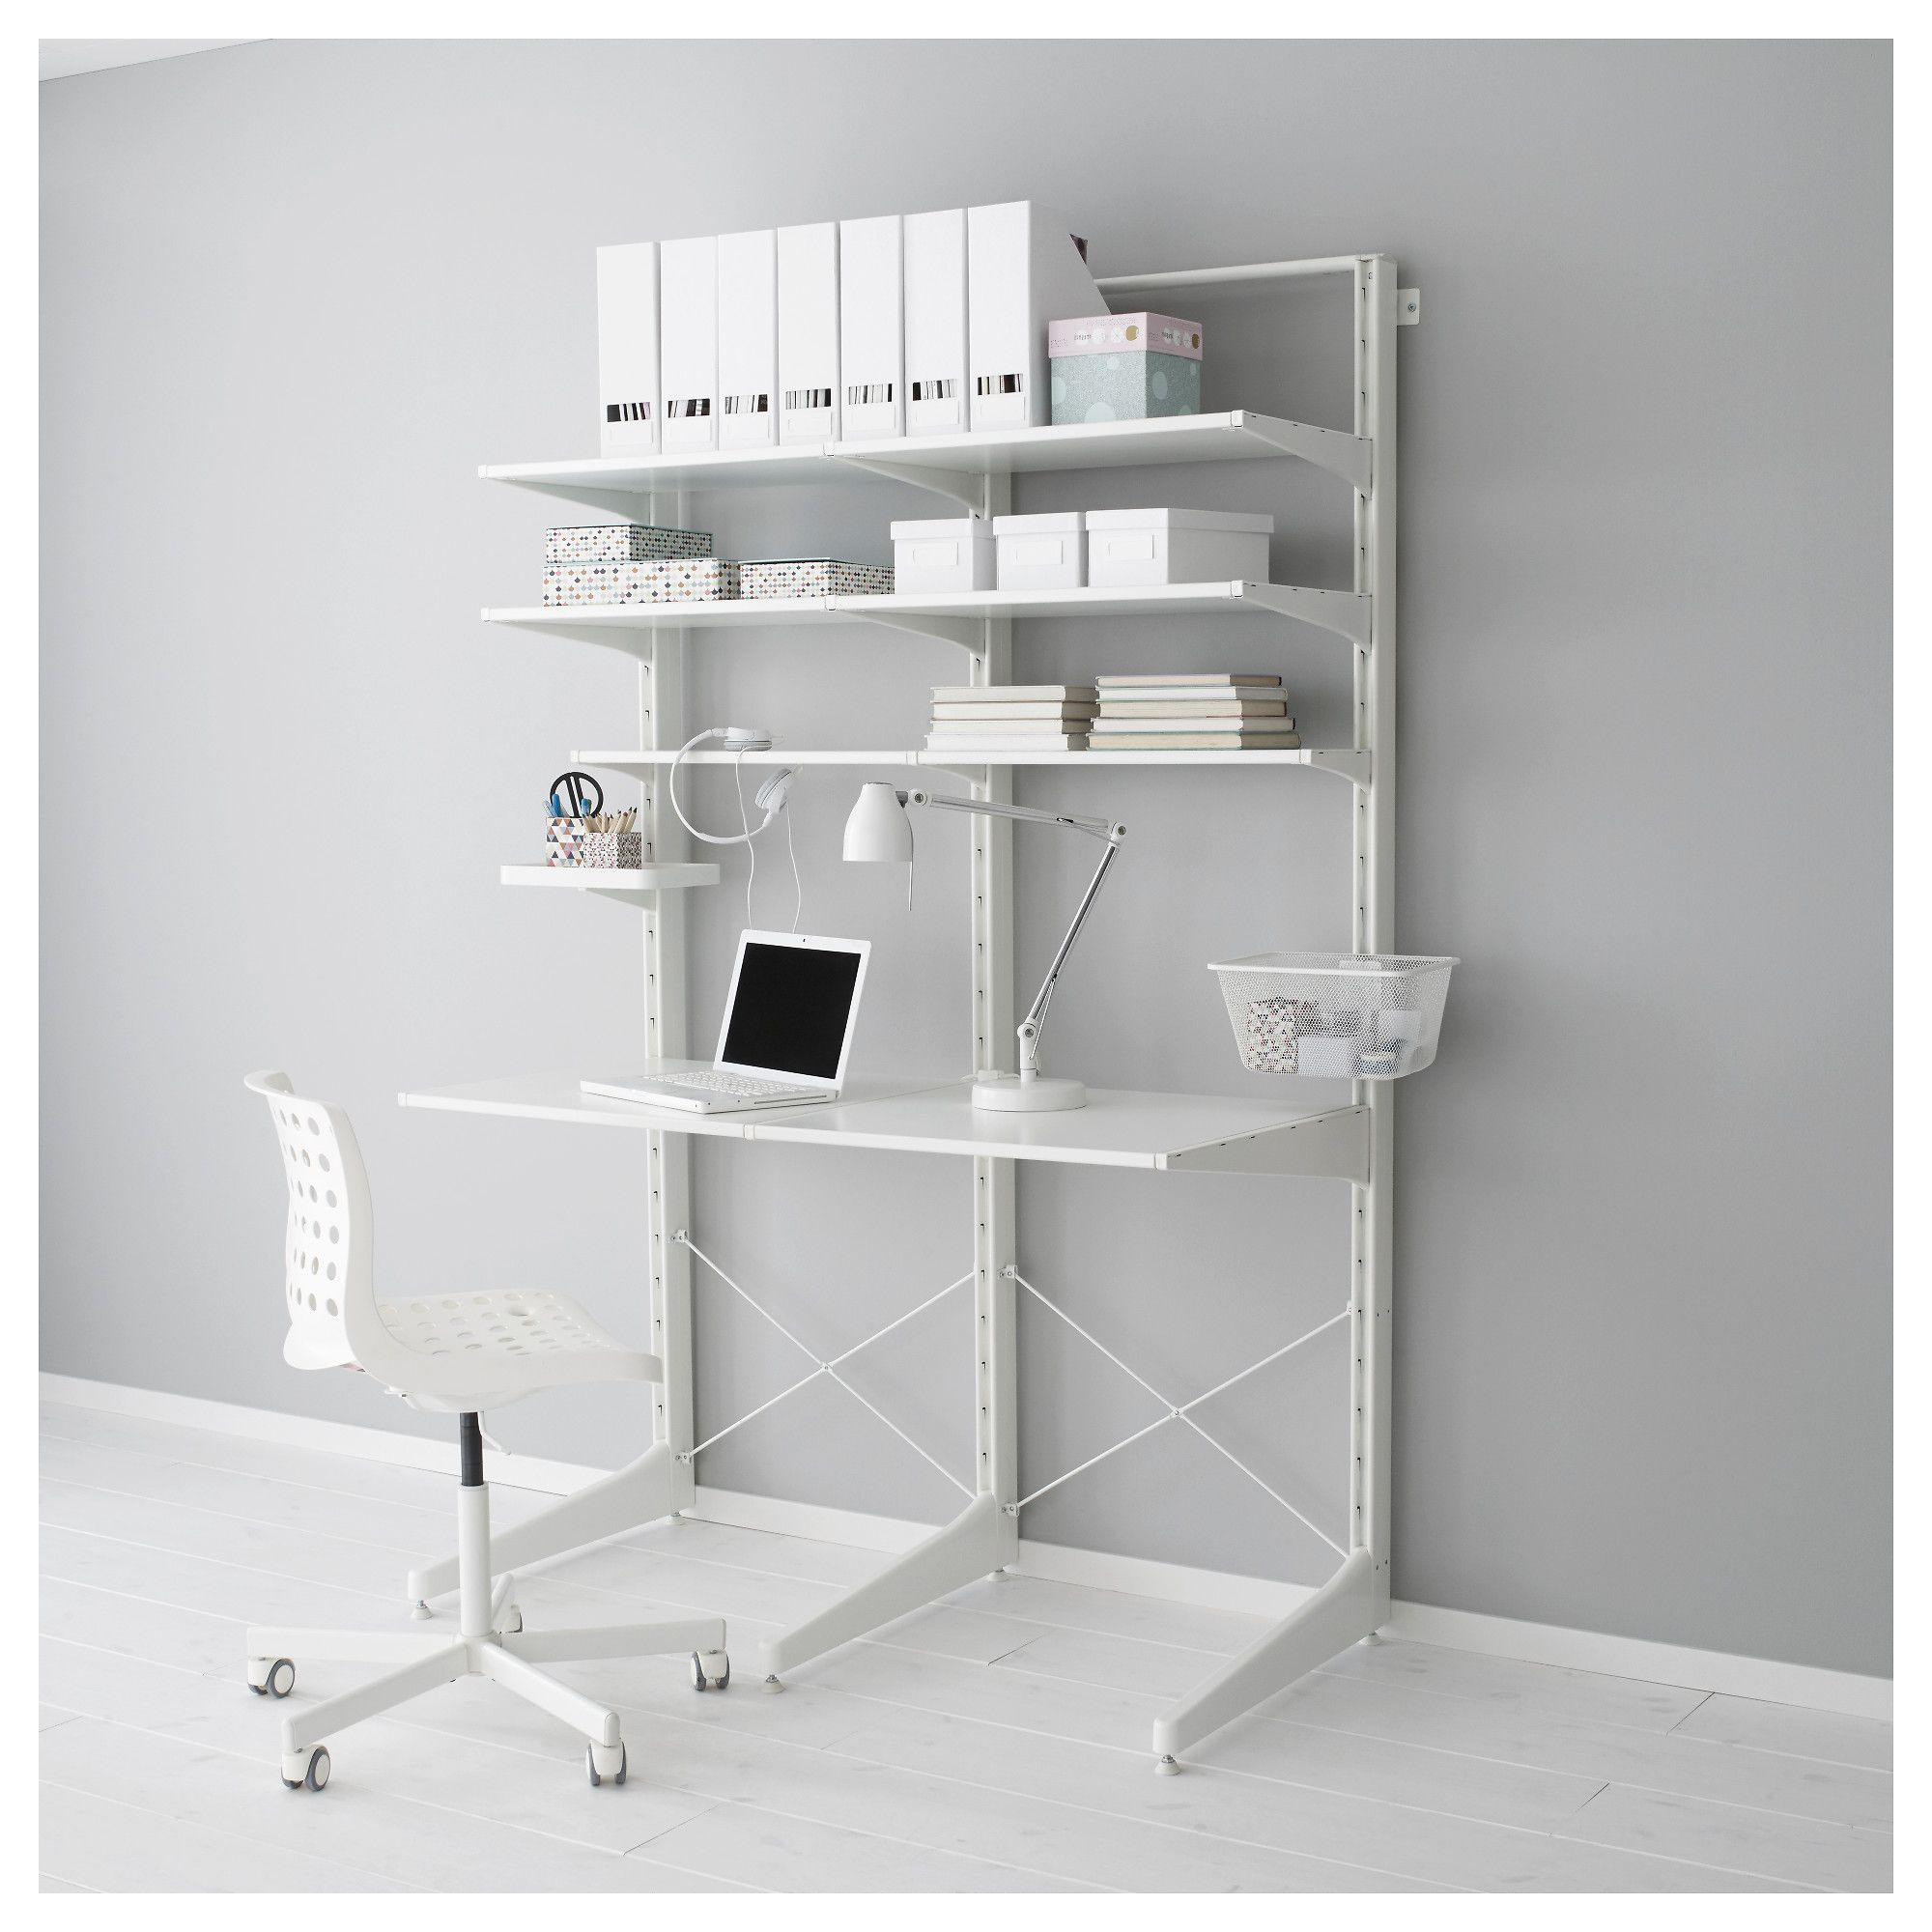 Ikea Algot Postfootshelves Living Room Ideas Ikea Algot